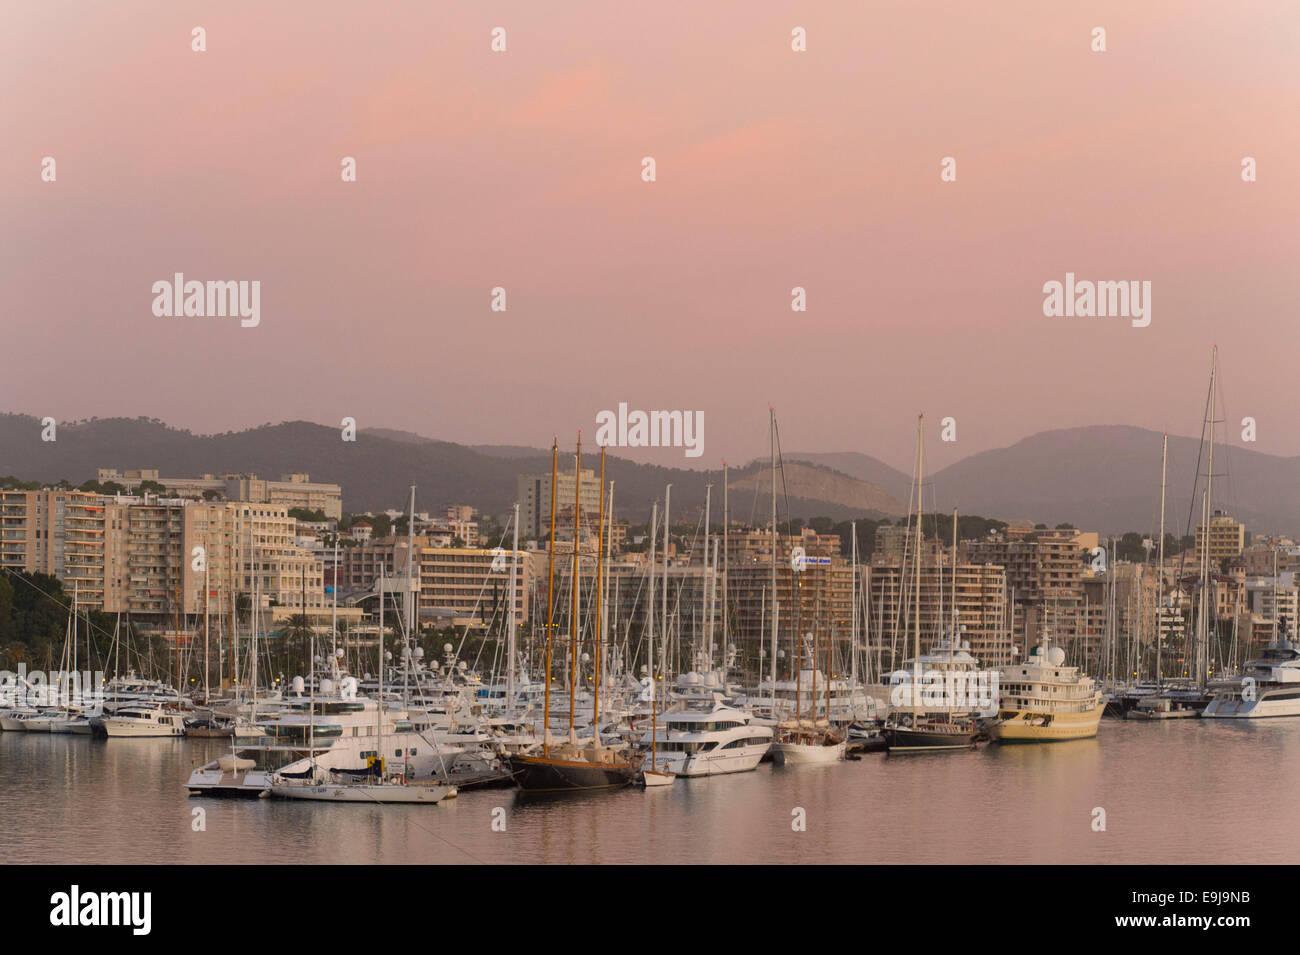 Boats and holiday apartments on the coast at Palma de Mallorca in Palma, Spain, at sunrise sunset. Stock Photo